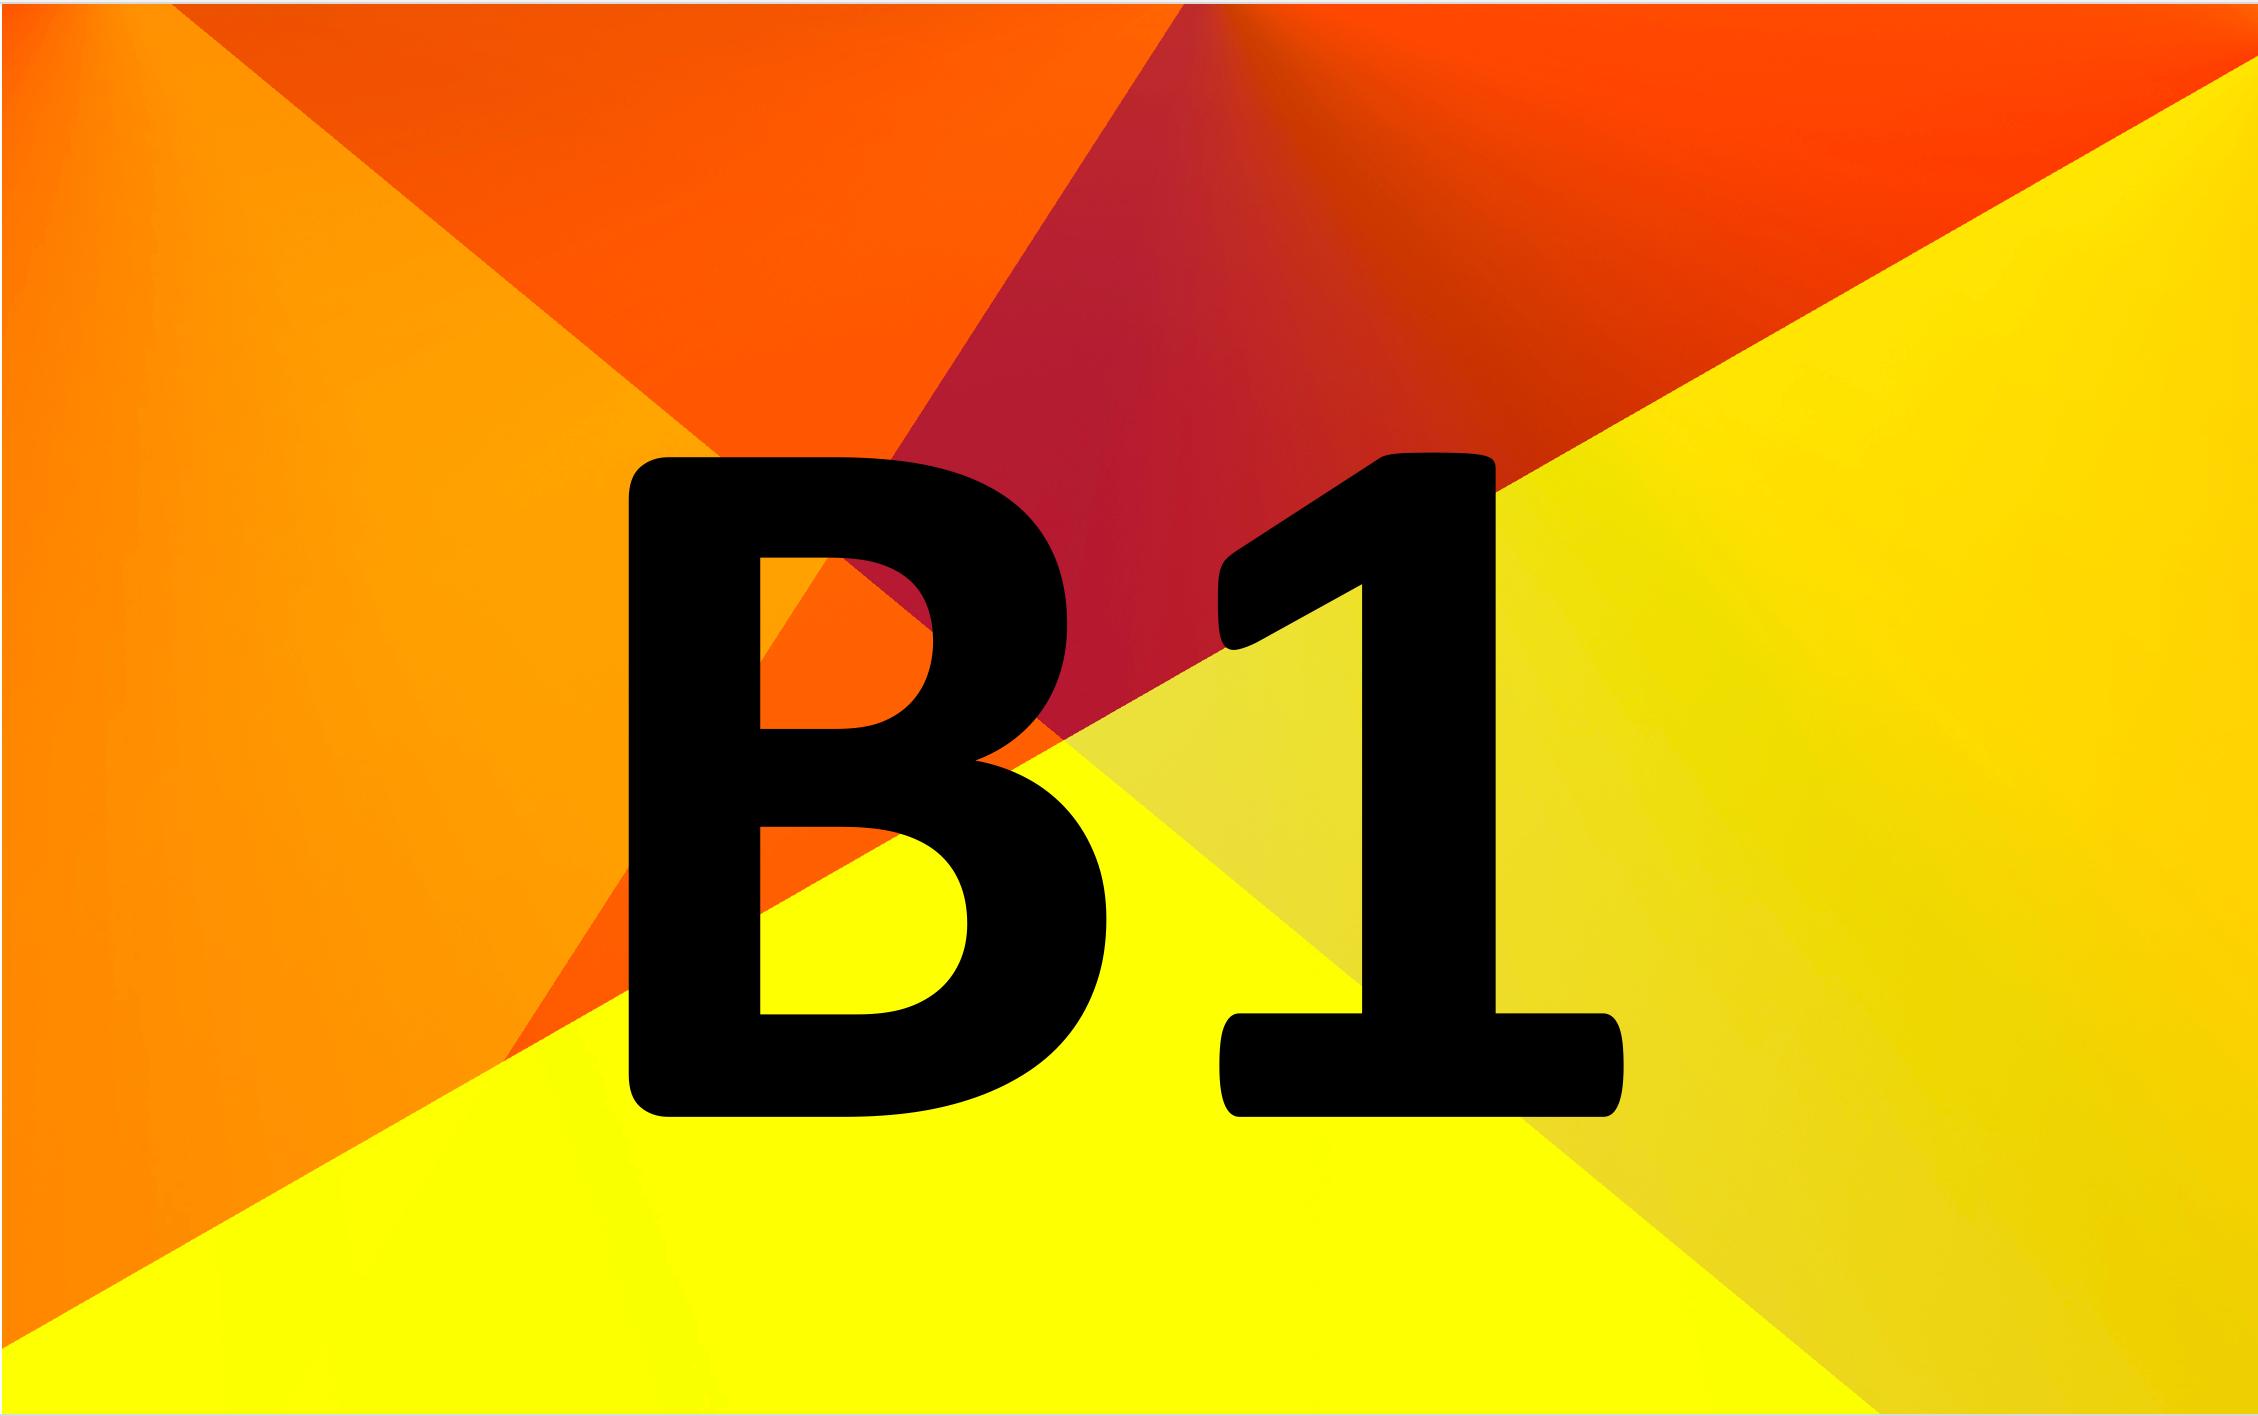 Goethe Zertifikat B1 Video Kurs German Test Success